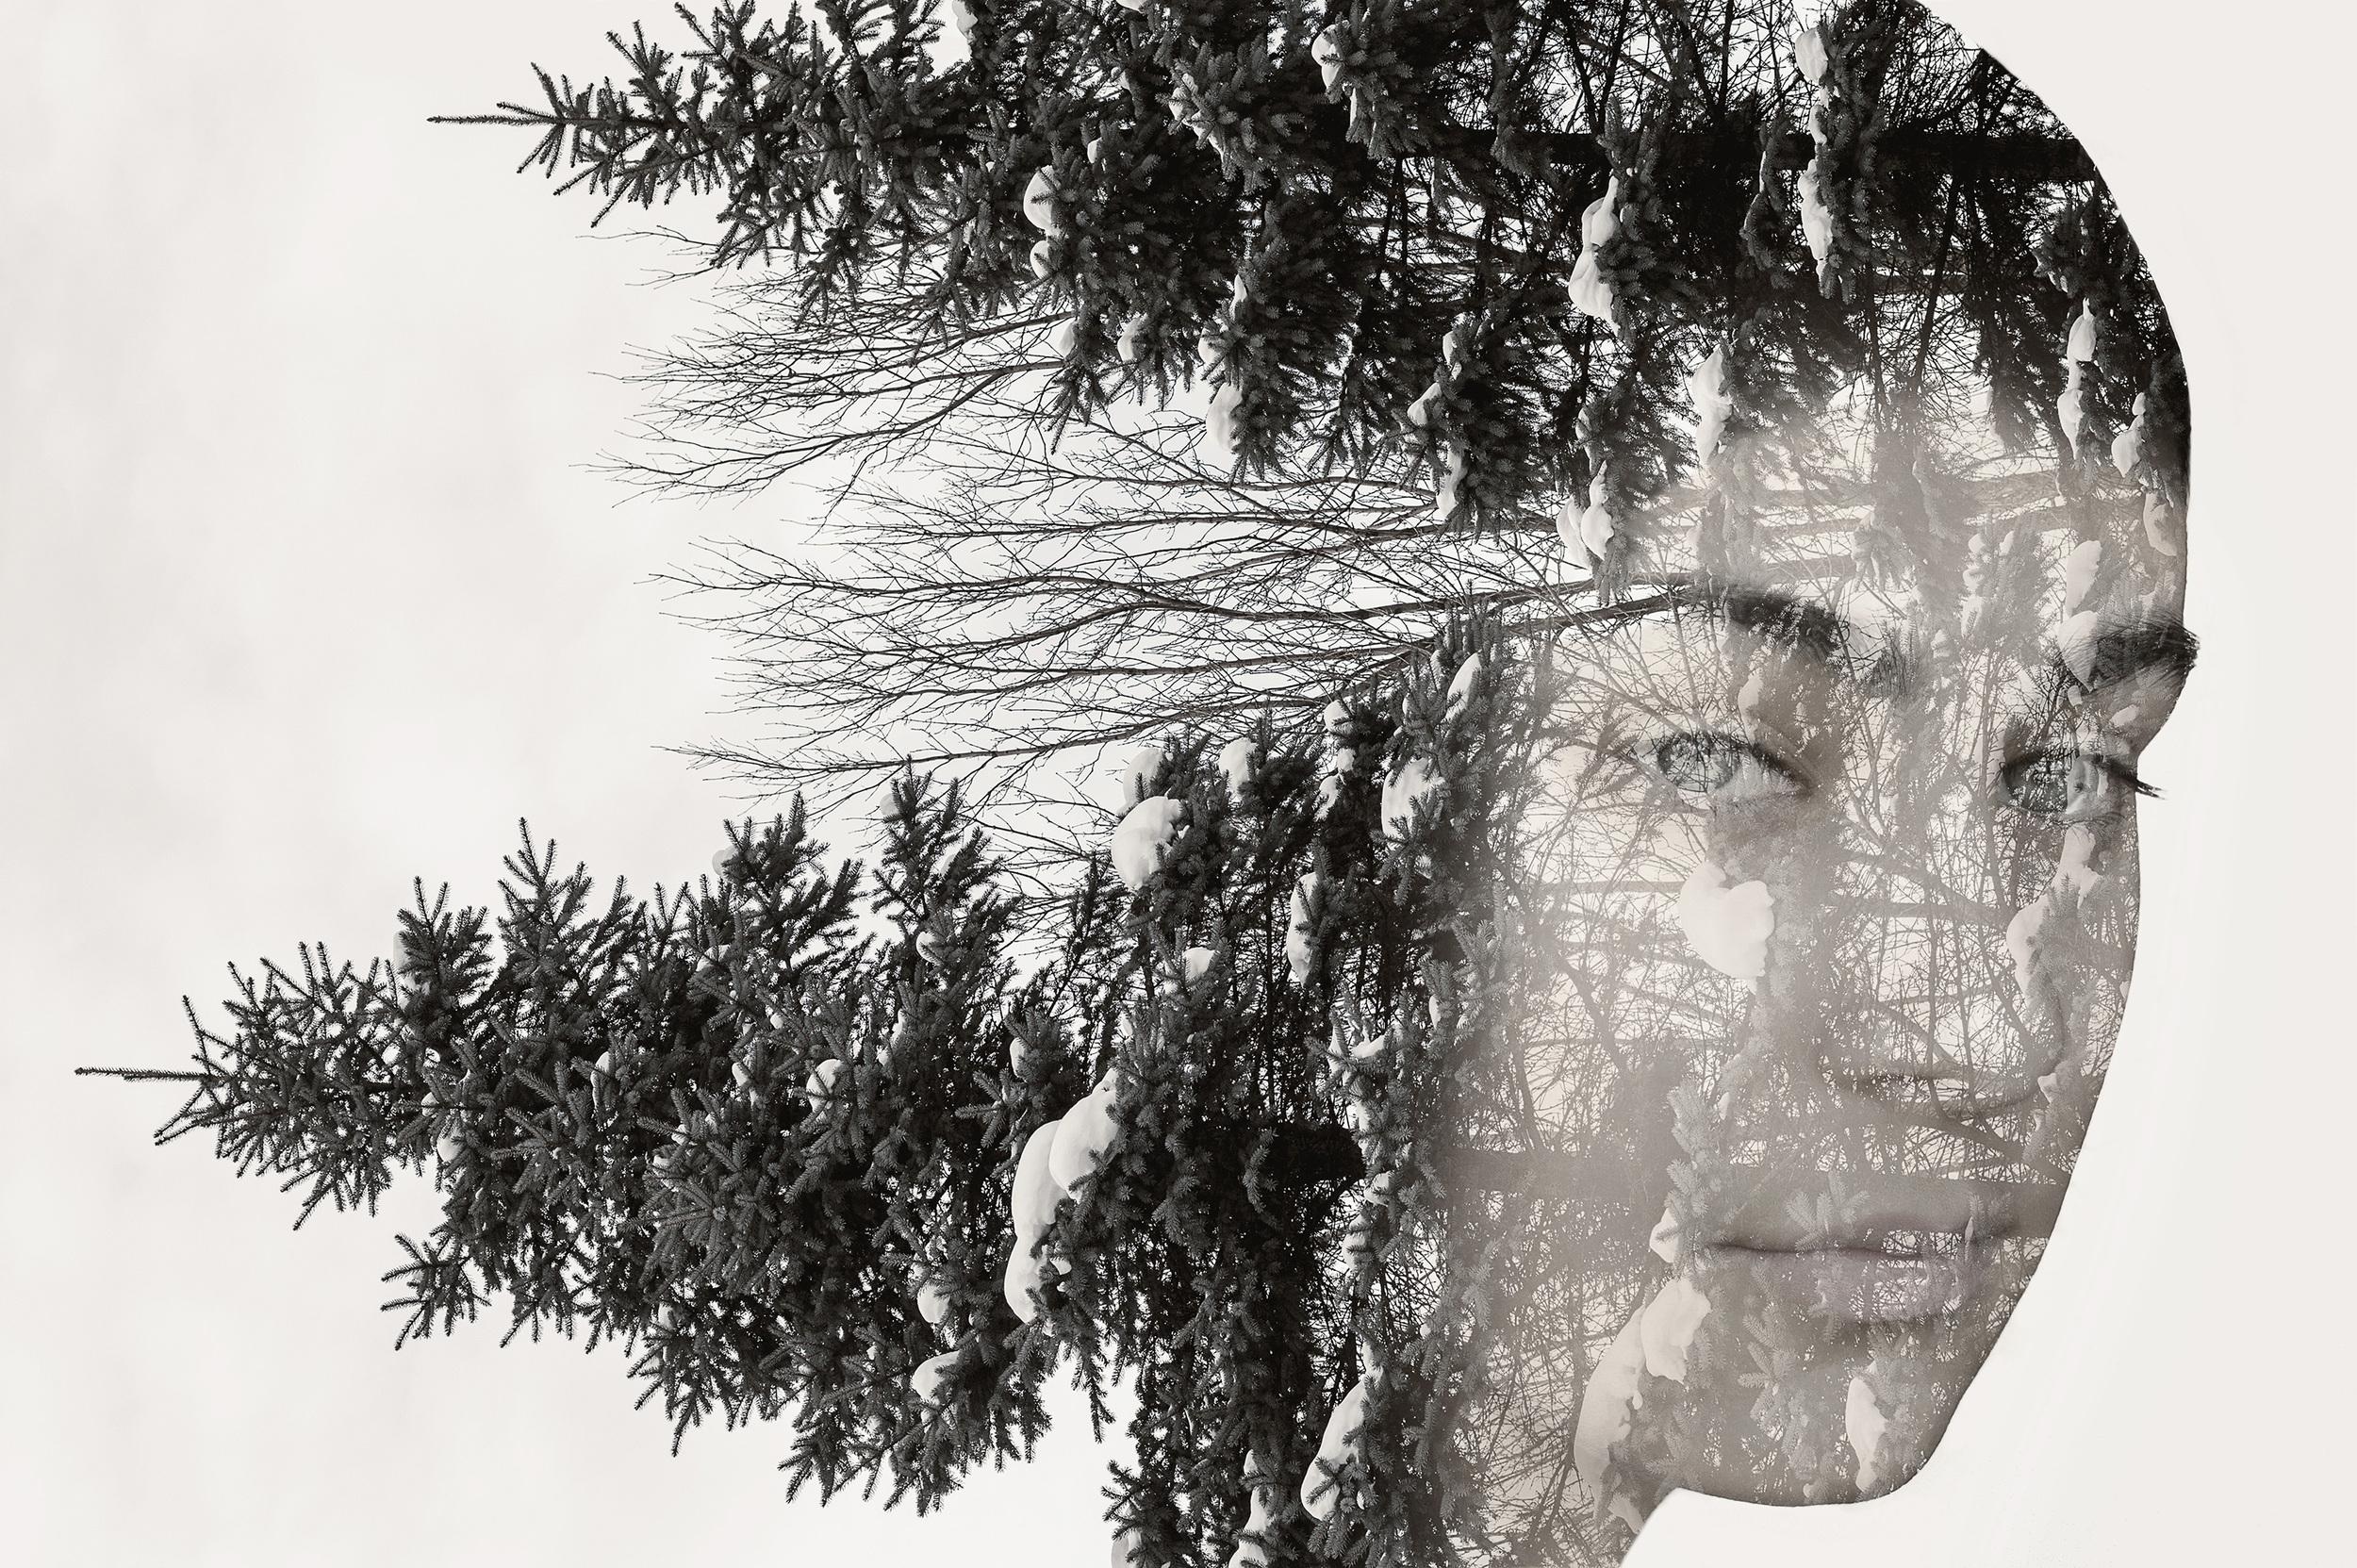 Evergreen Queen © Deena Roth Photography